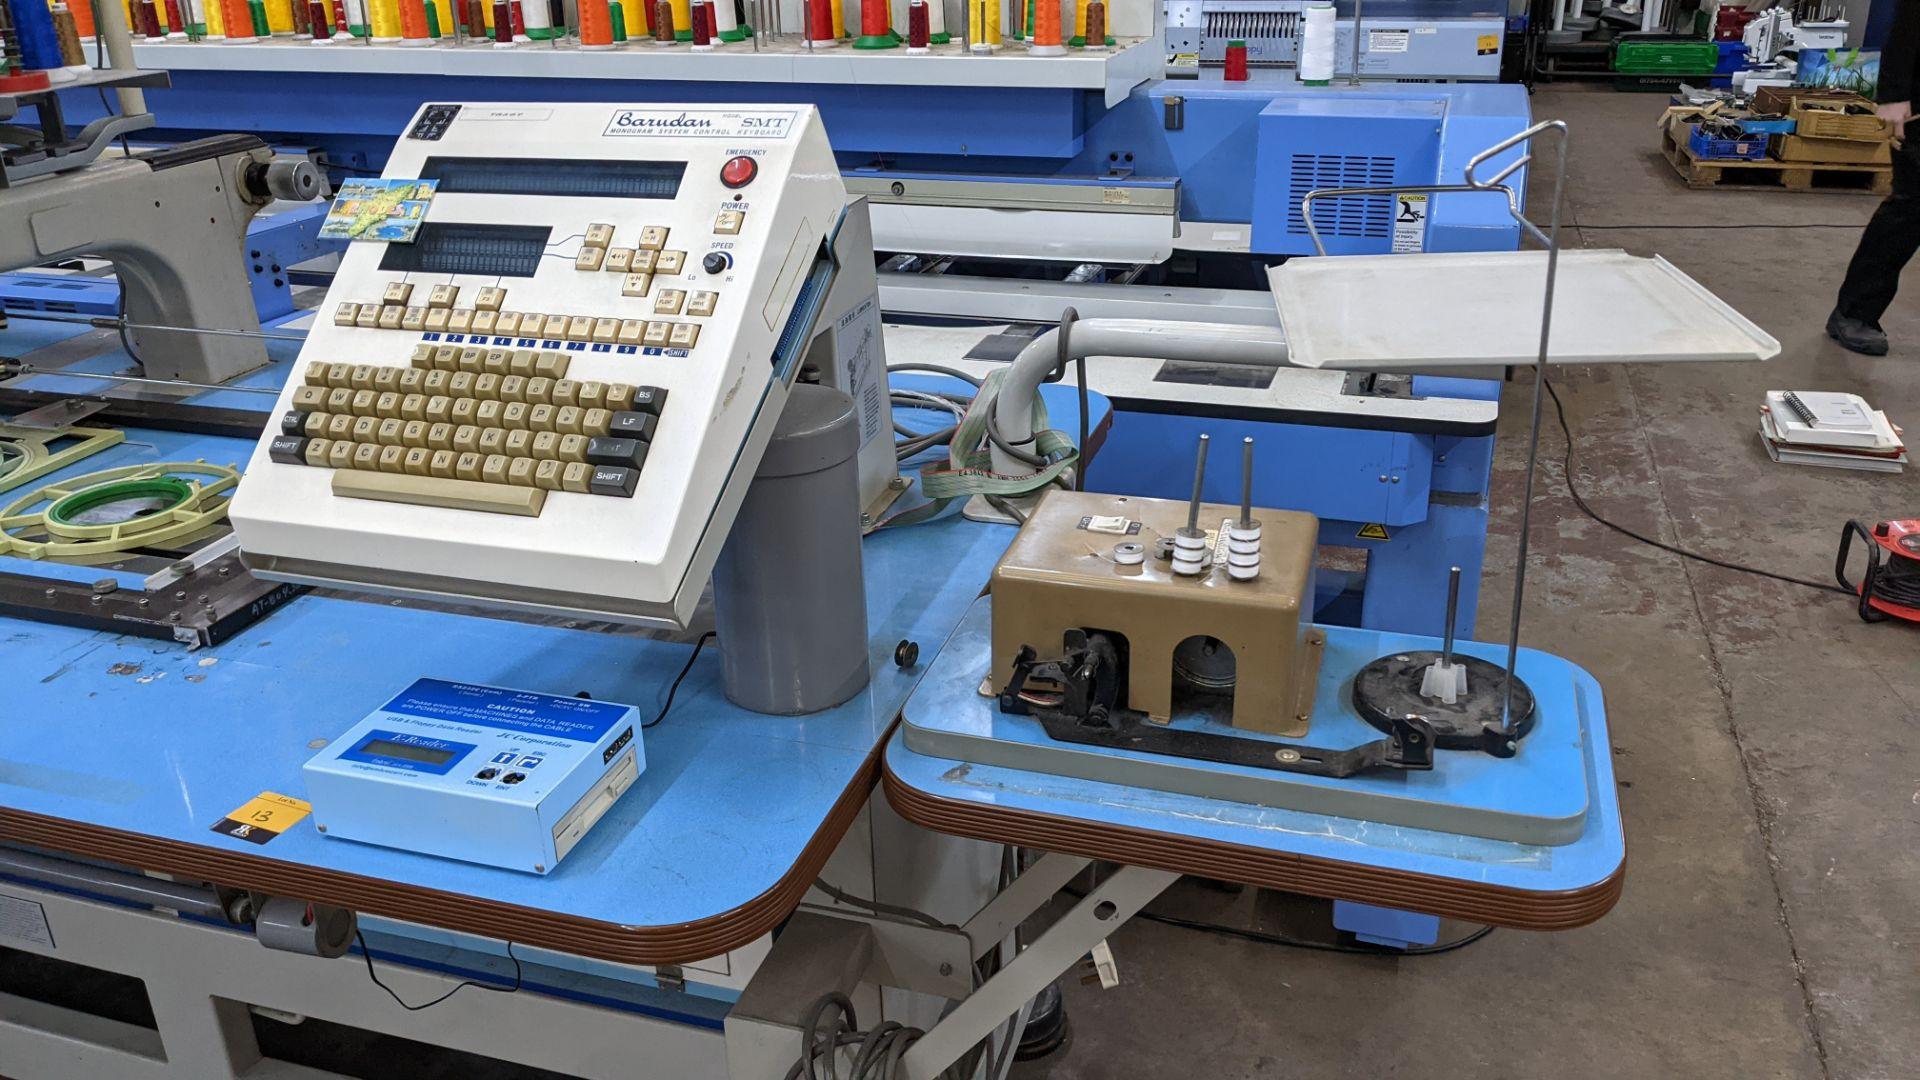 Barudan 4 head embroidery machine, model BEAT 804TYS, 7 needles per head - Image 6 of 24